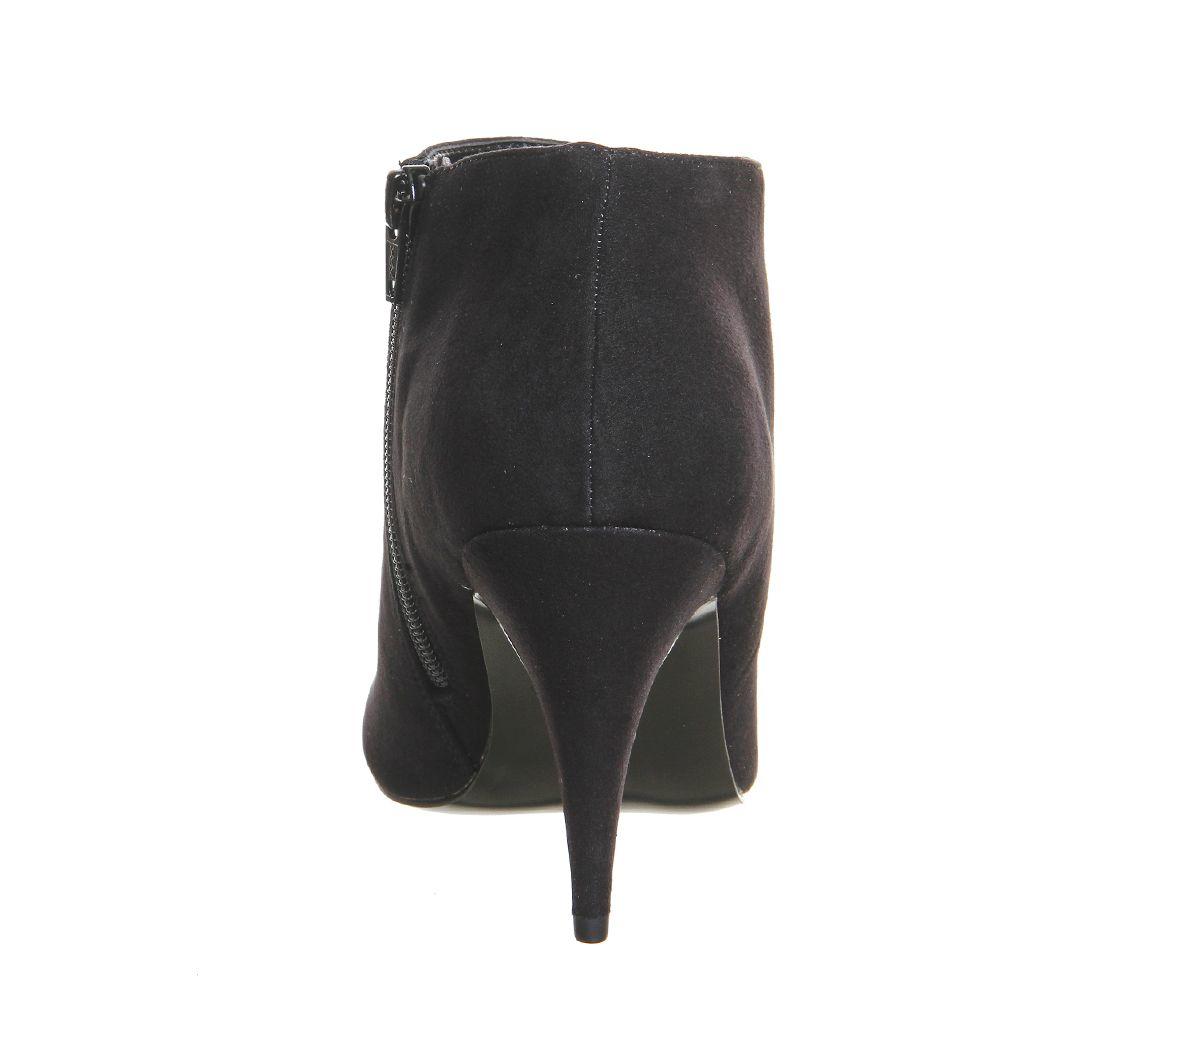 Office Quintet Shoe Boots in Black